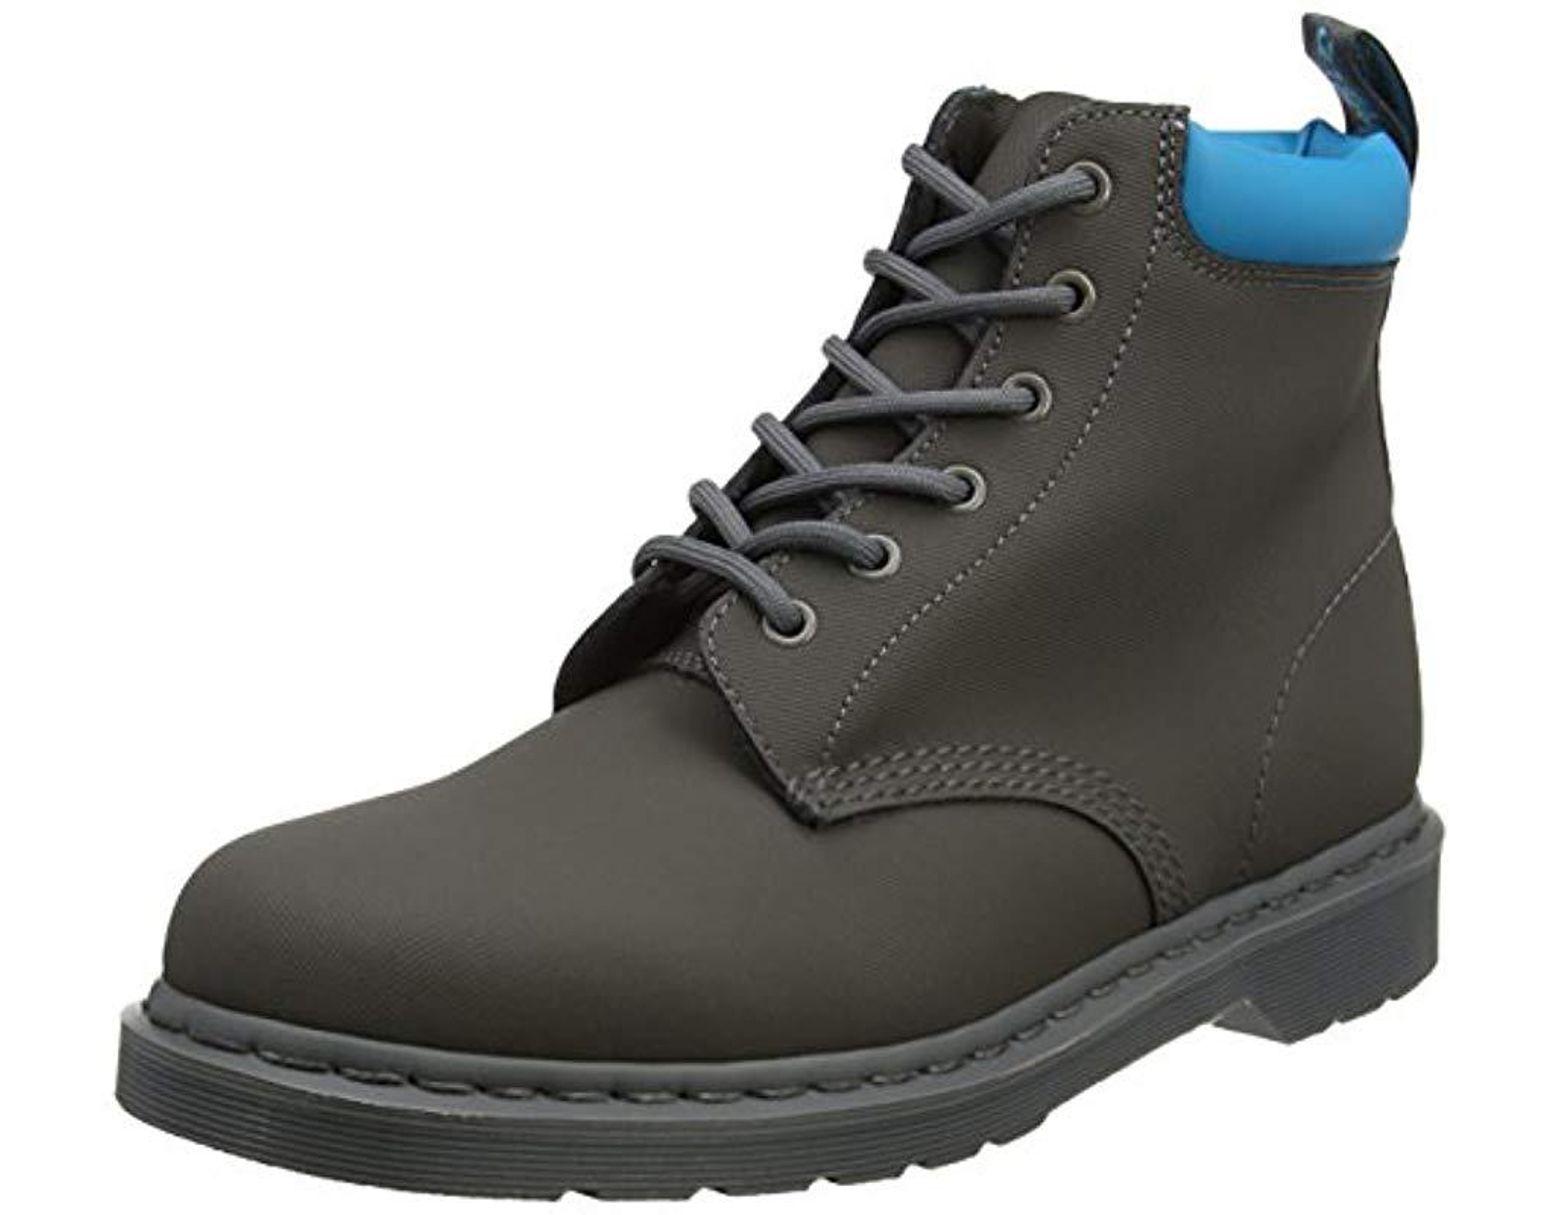 0ef1a6dfbb2 Dr. Martens 939 Gunmetal+soft Blue Ajax+pu Boots in Blue for Men - Lyst